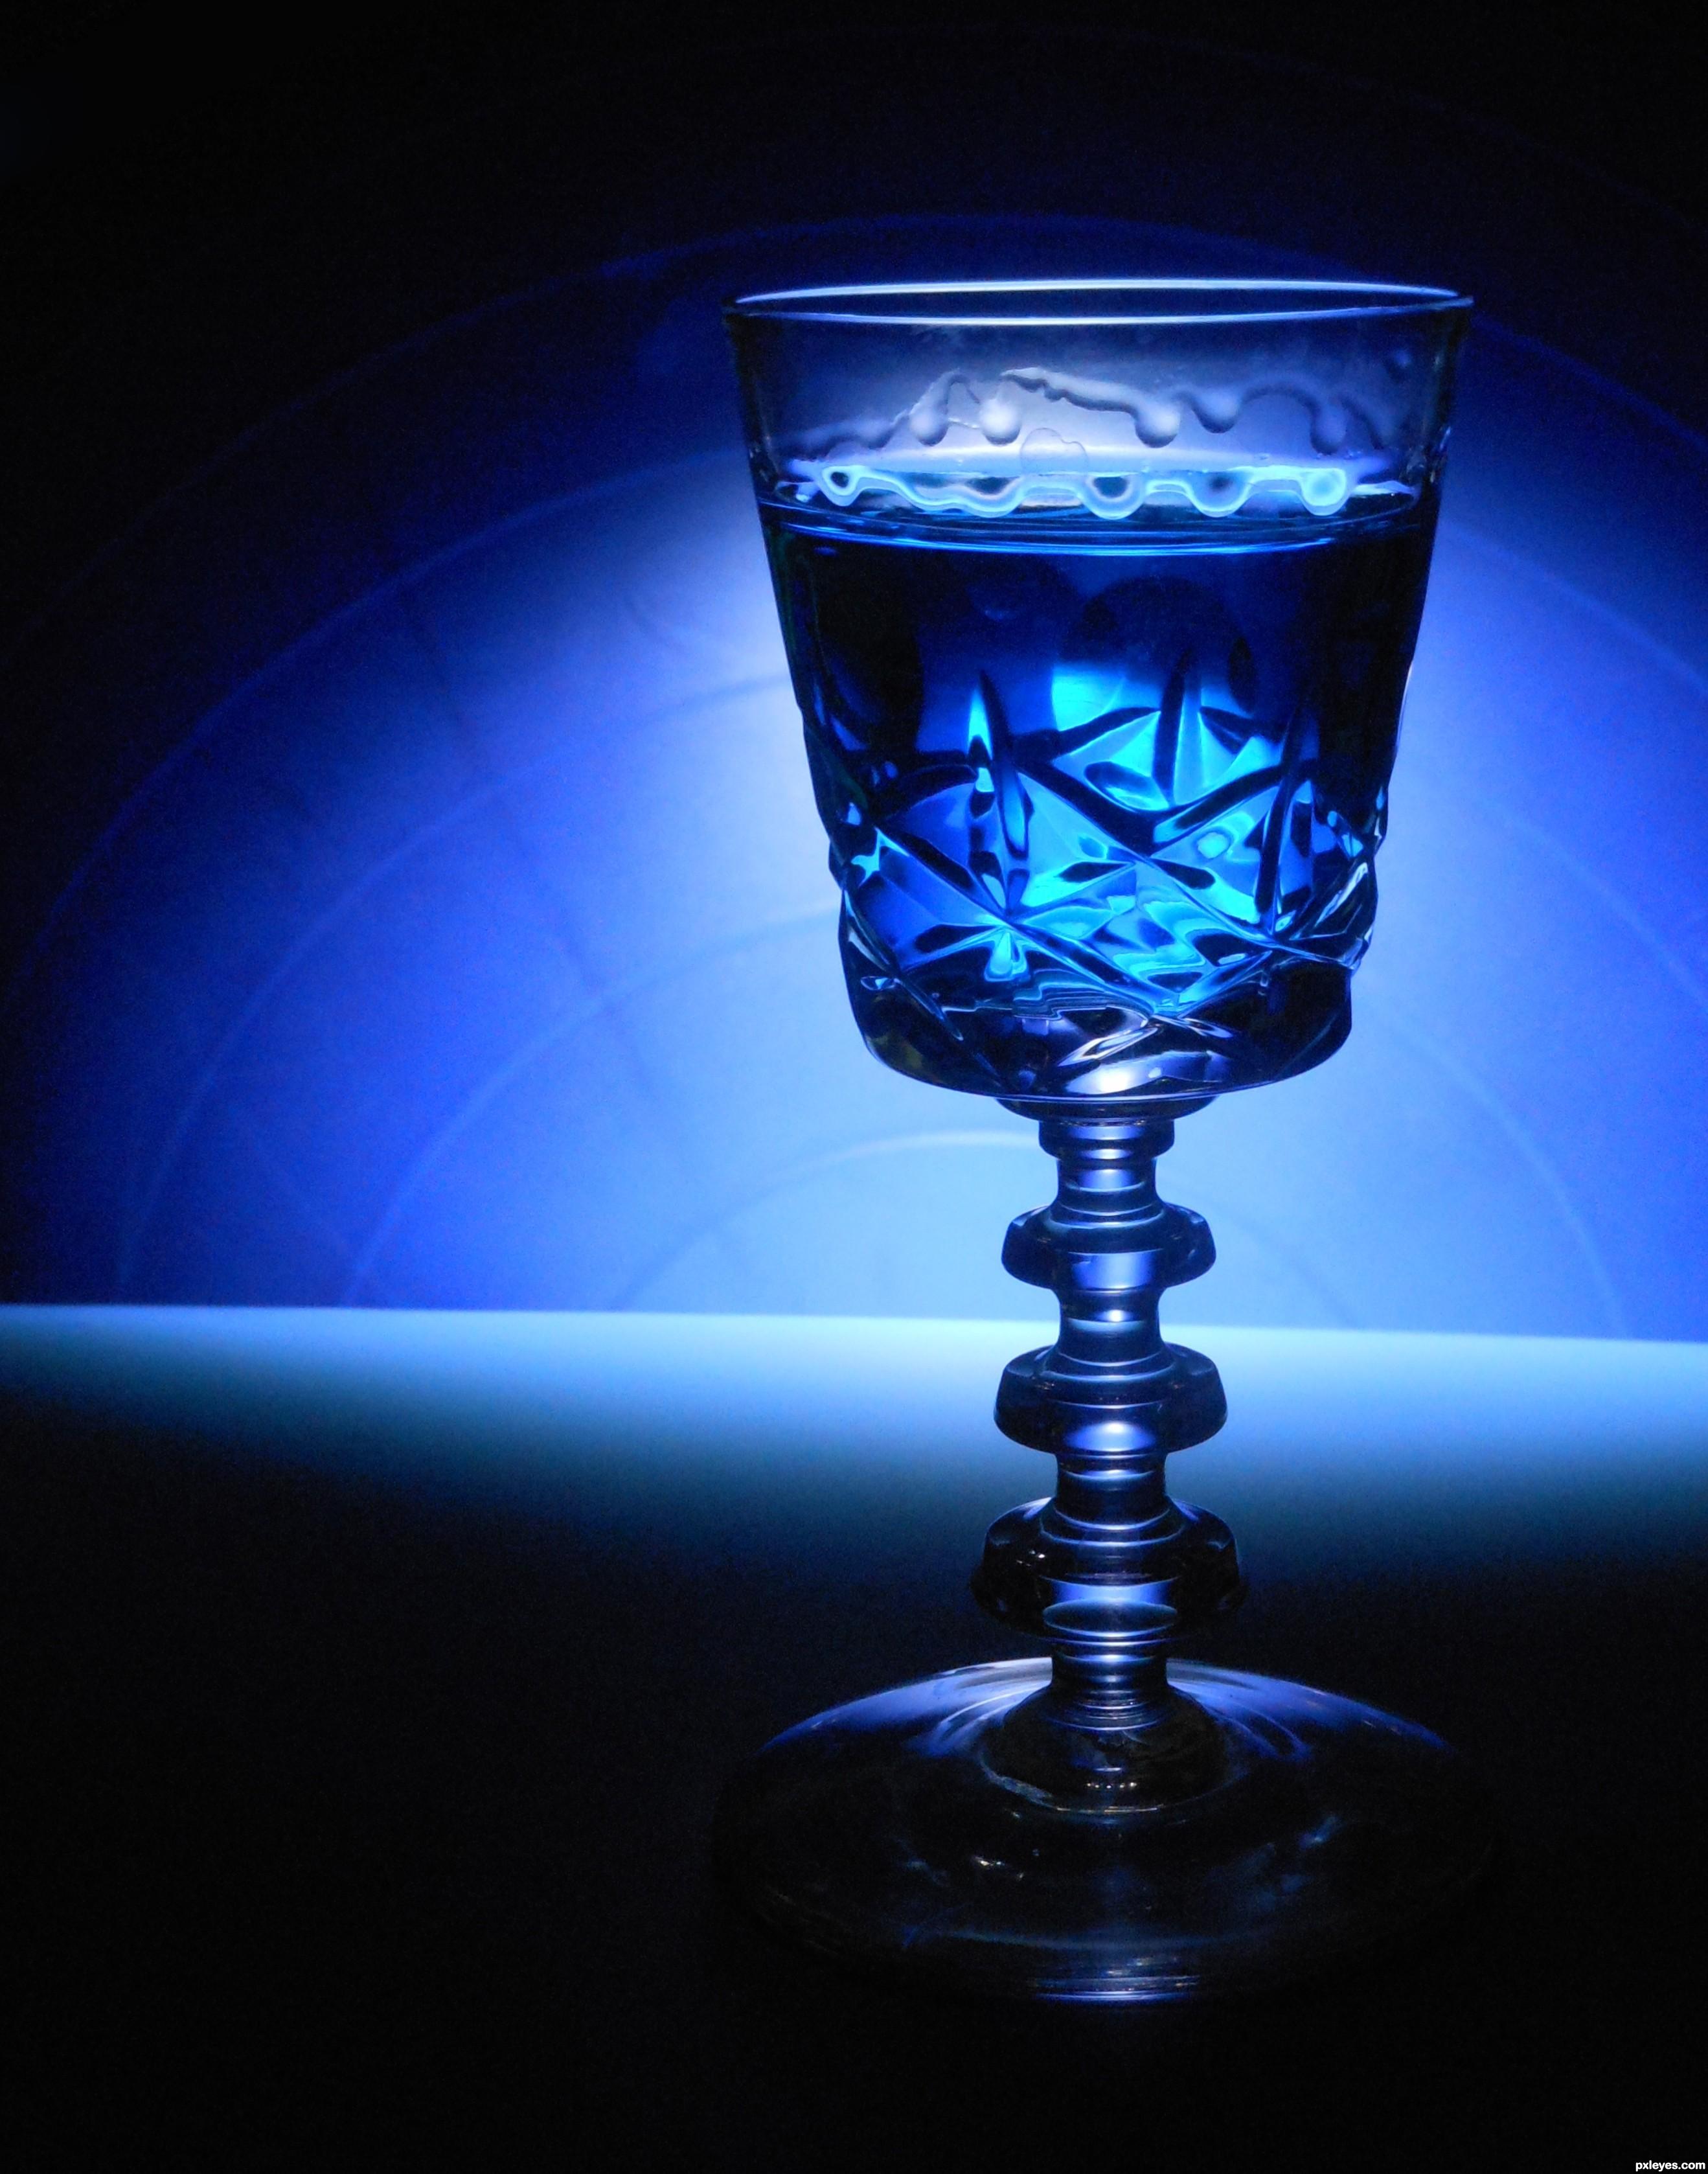 Blue on blue on blue